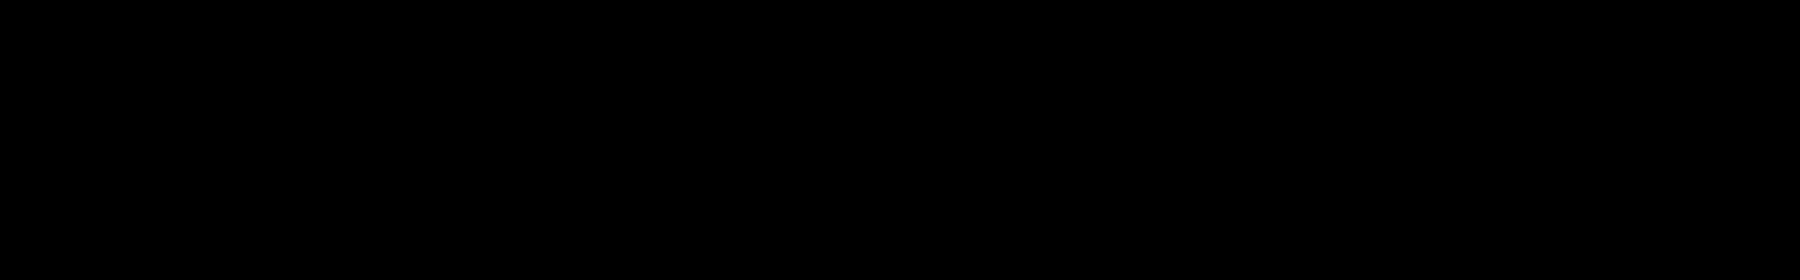 Ultimate Glitch Hop audio waveform